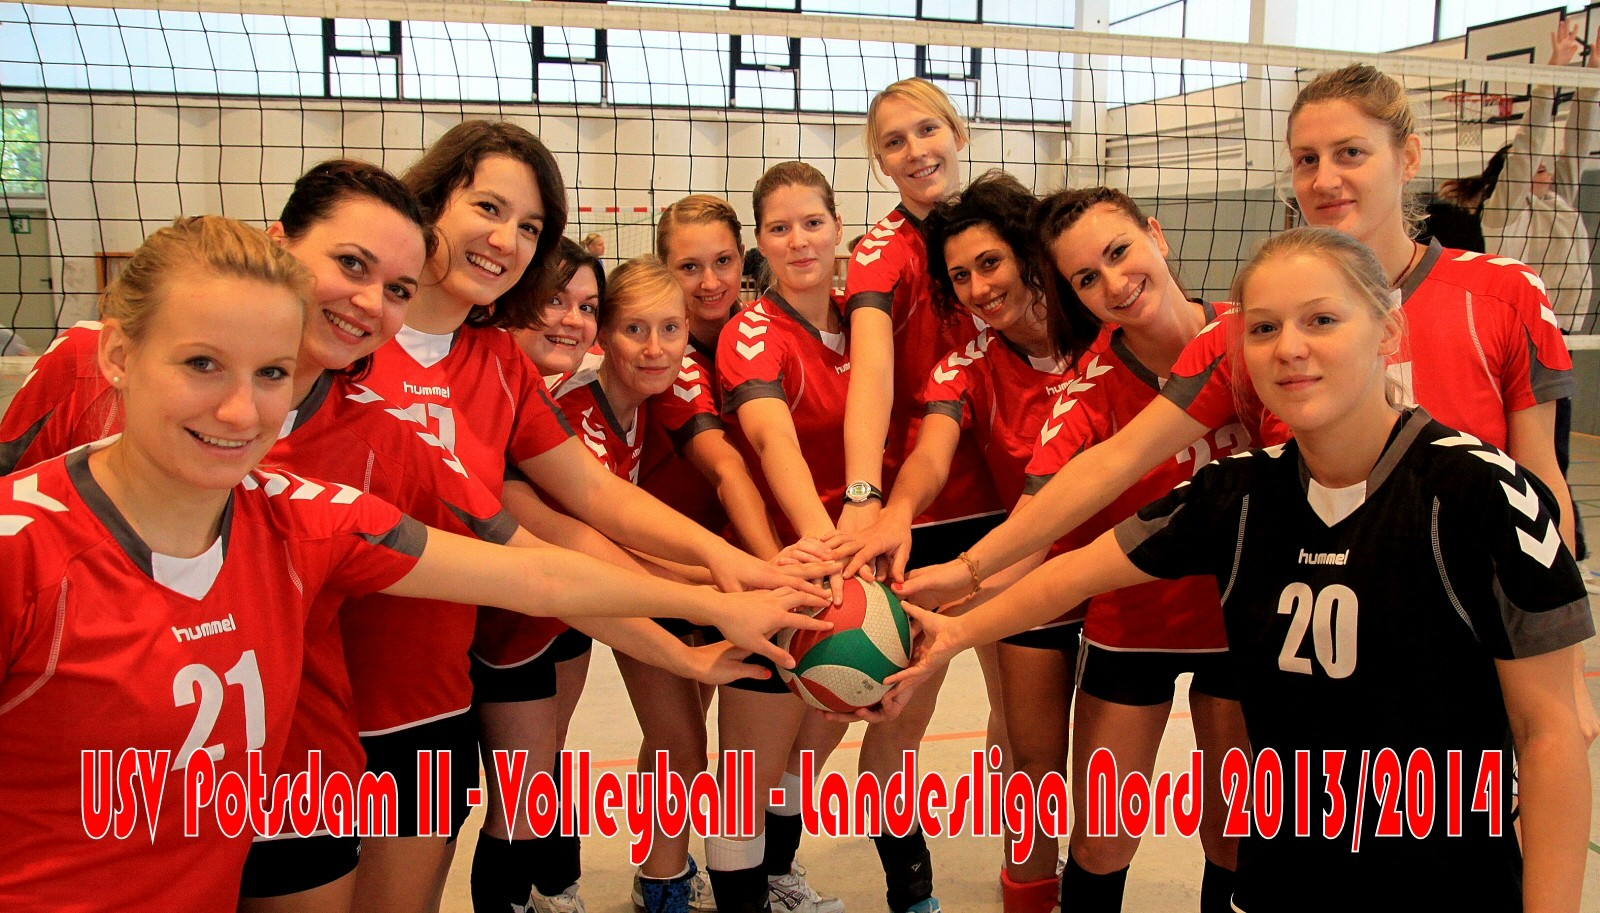 Landesliga Nord 2013/2014